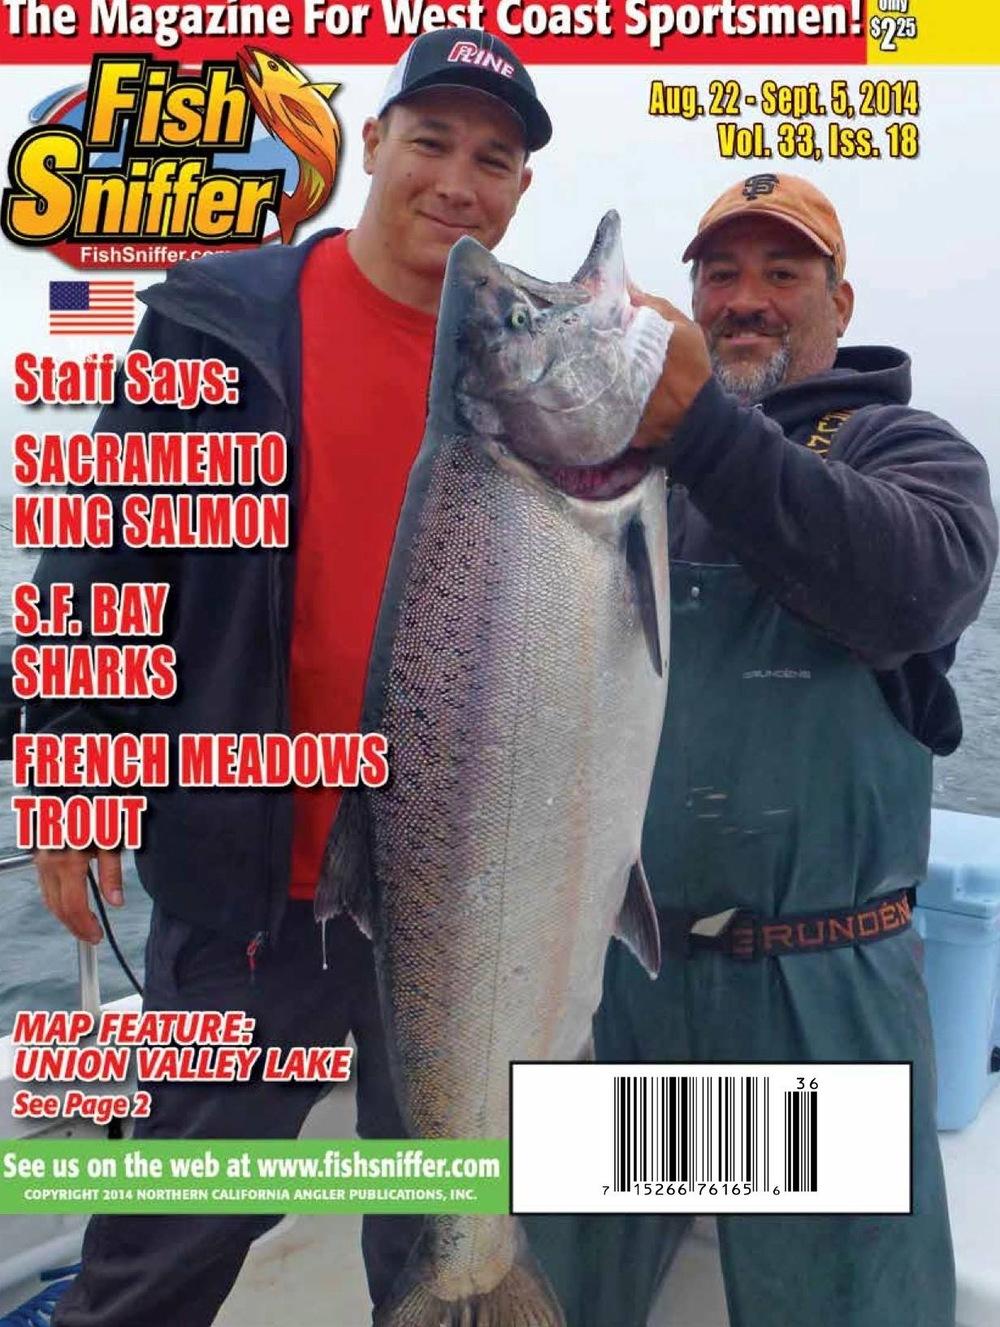 Fish Sniffer Cover Shot Captain Tim Wong & Jeff CaramellaNorCal Sportfishing Adventures